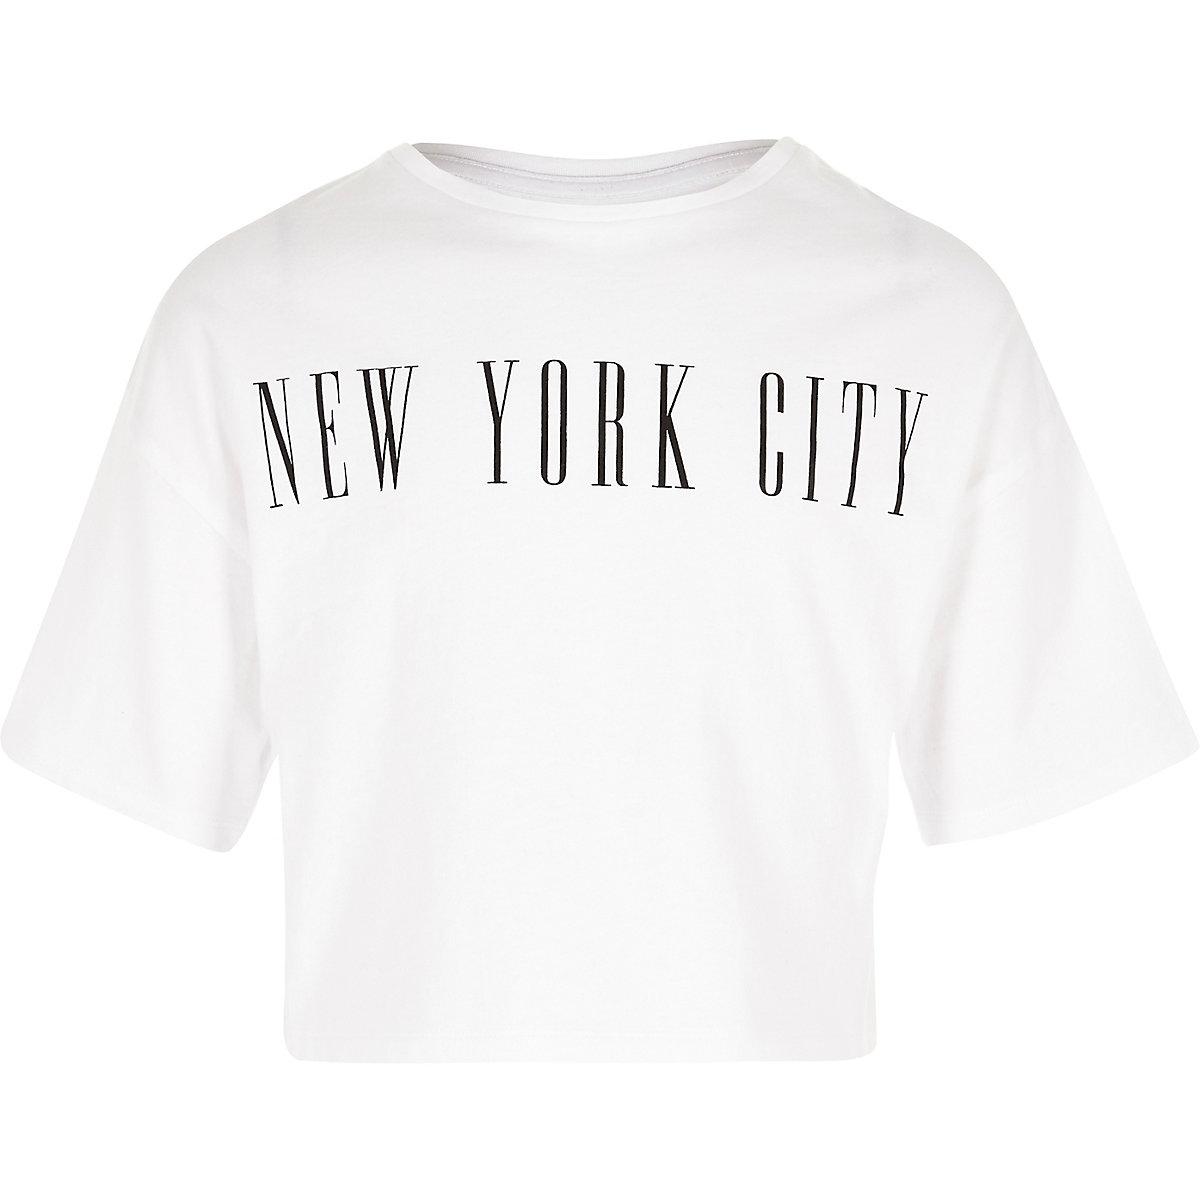 "Weißes, kurzes T-Shirt ""New York City"""